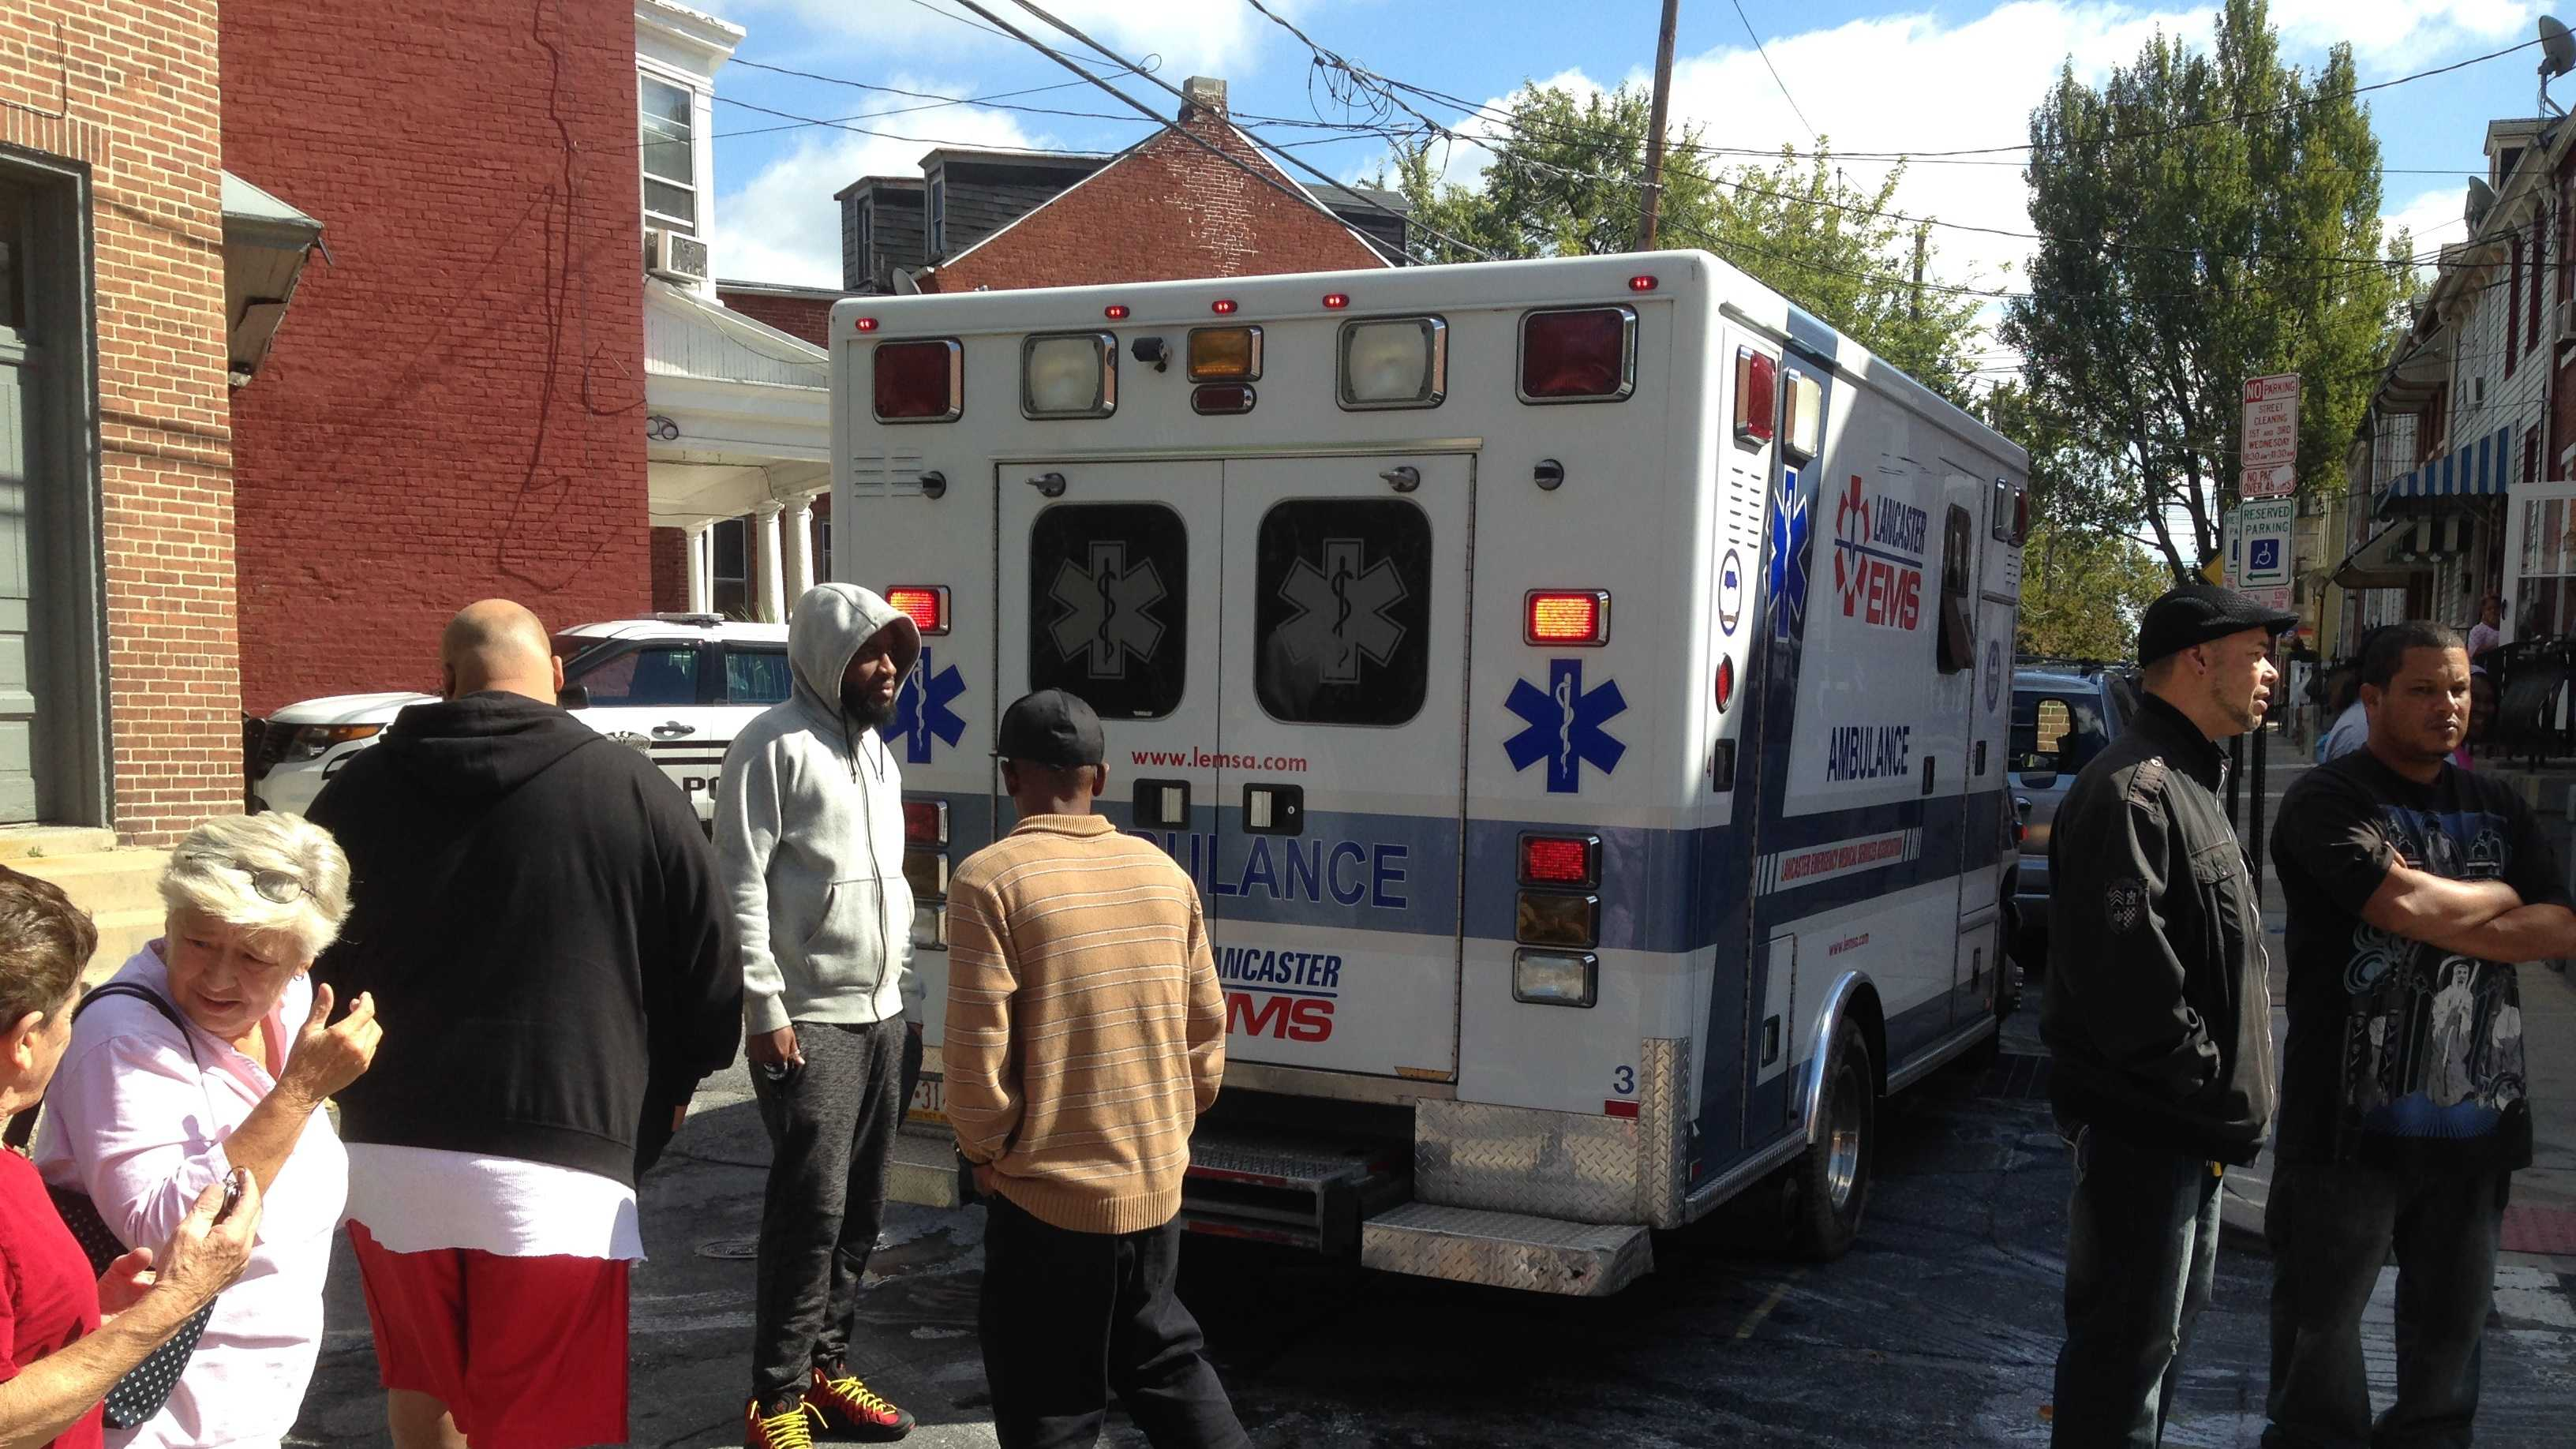 The stabbing happened around 12:30 p.m. on Monday, Oct. 5.